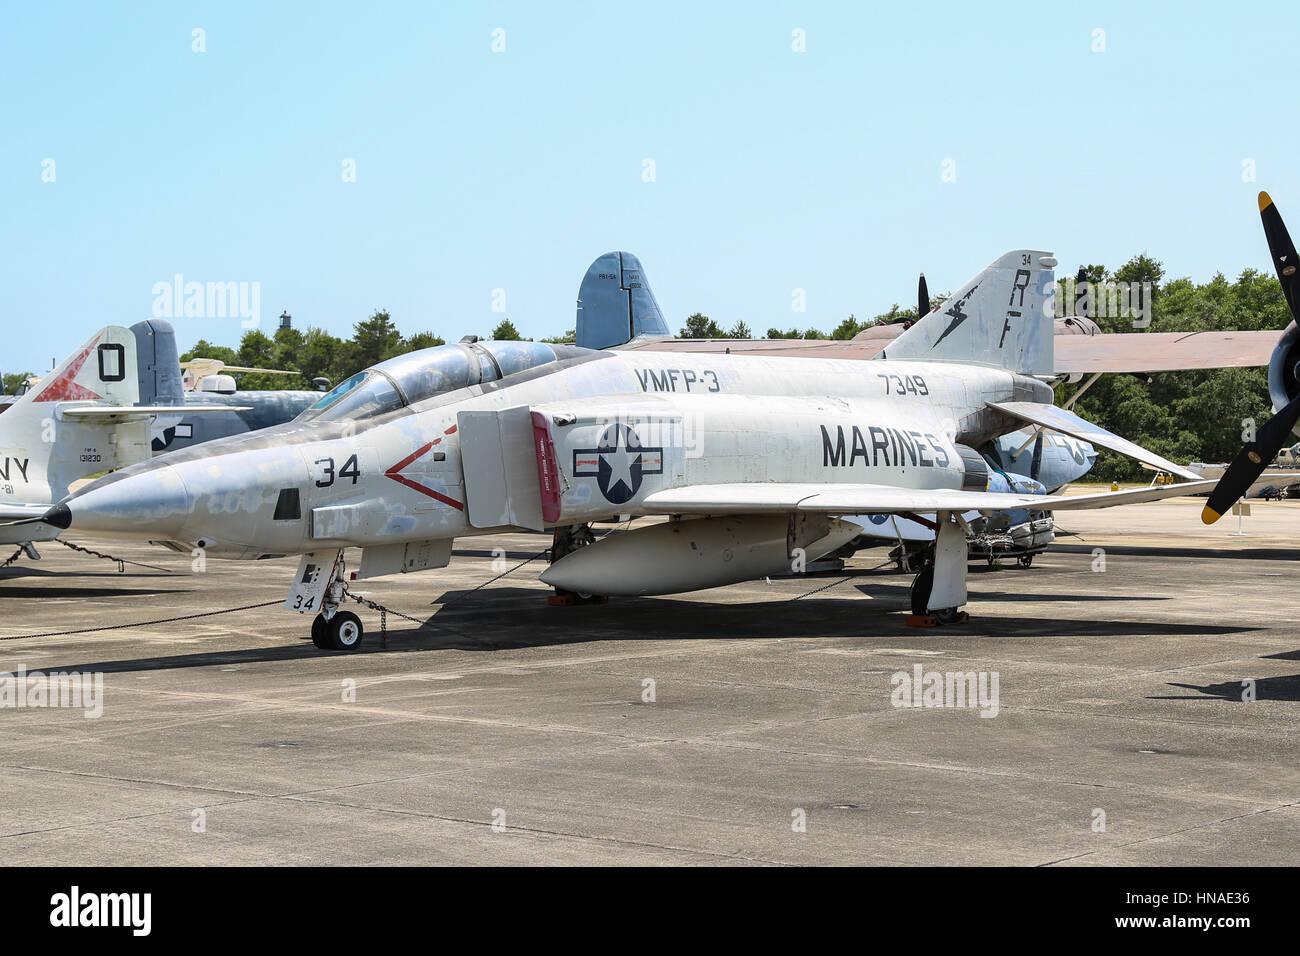 McDonnell Douglas F-4 Phantom II - Marine Corps RF-4B - Stock Image